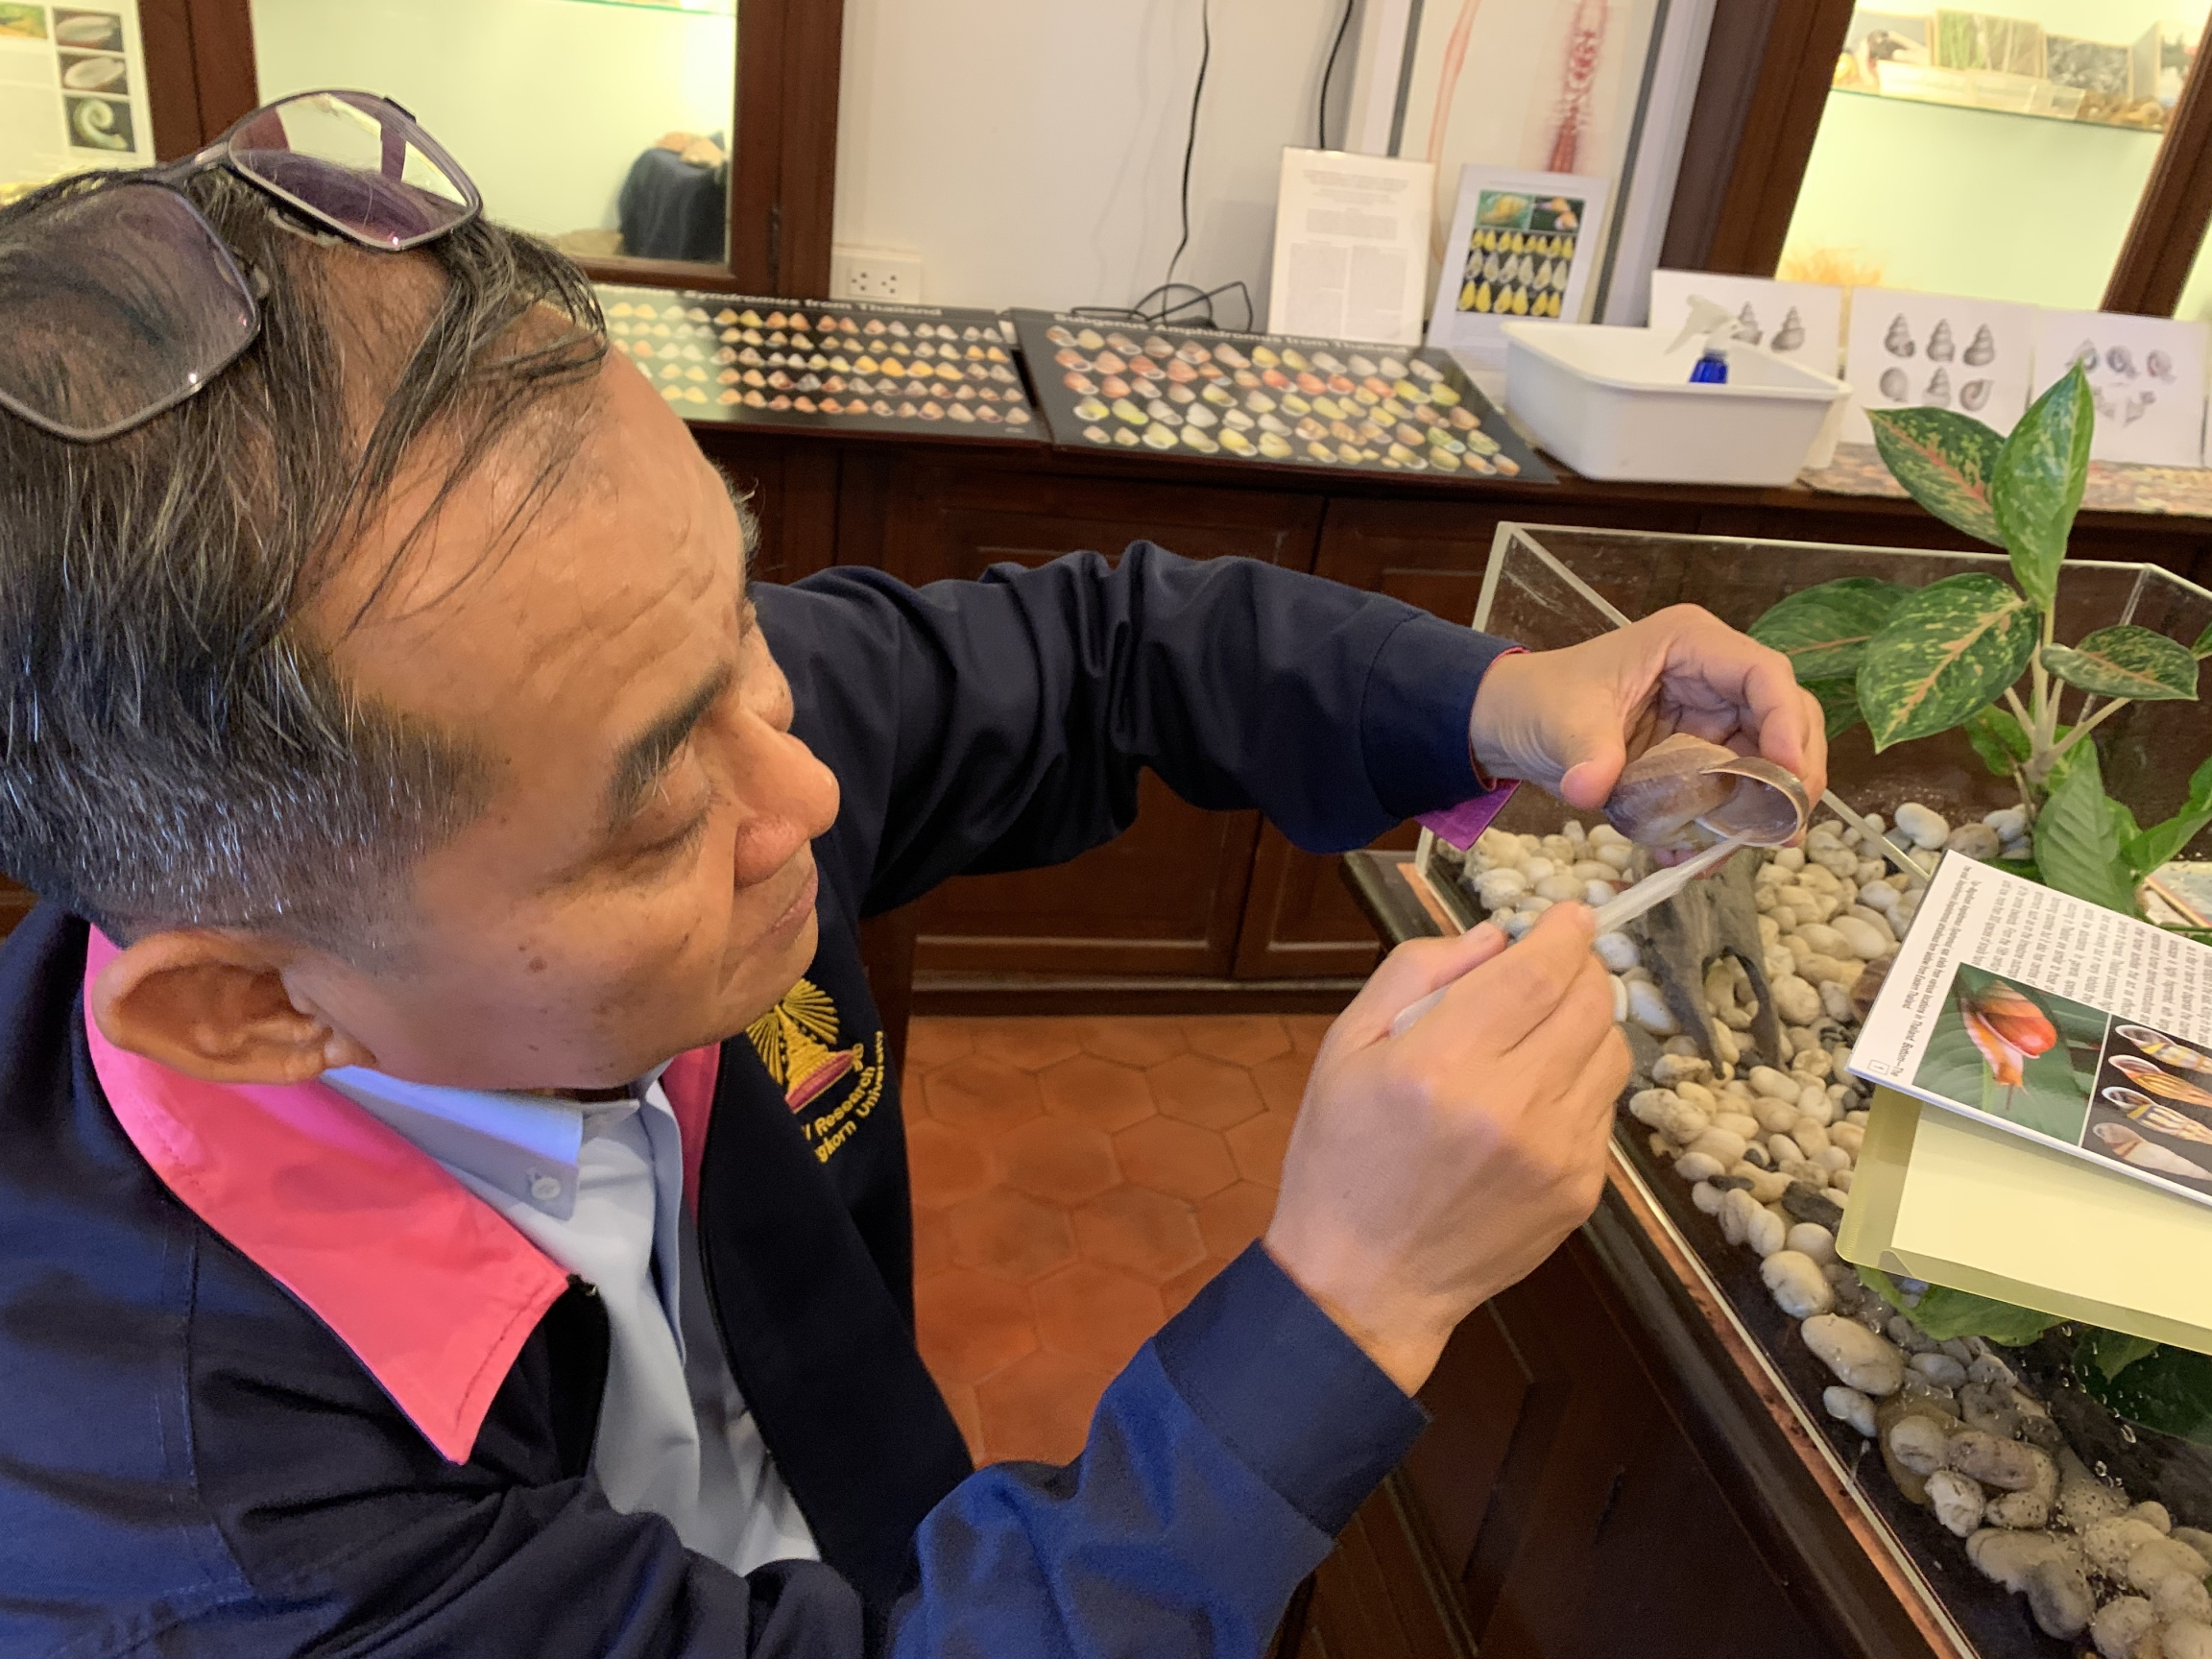 Somsak Panha isa biologist who is known as Thailand's top snail guru.